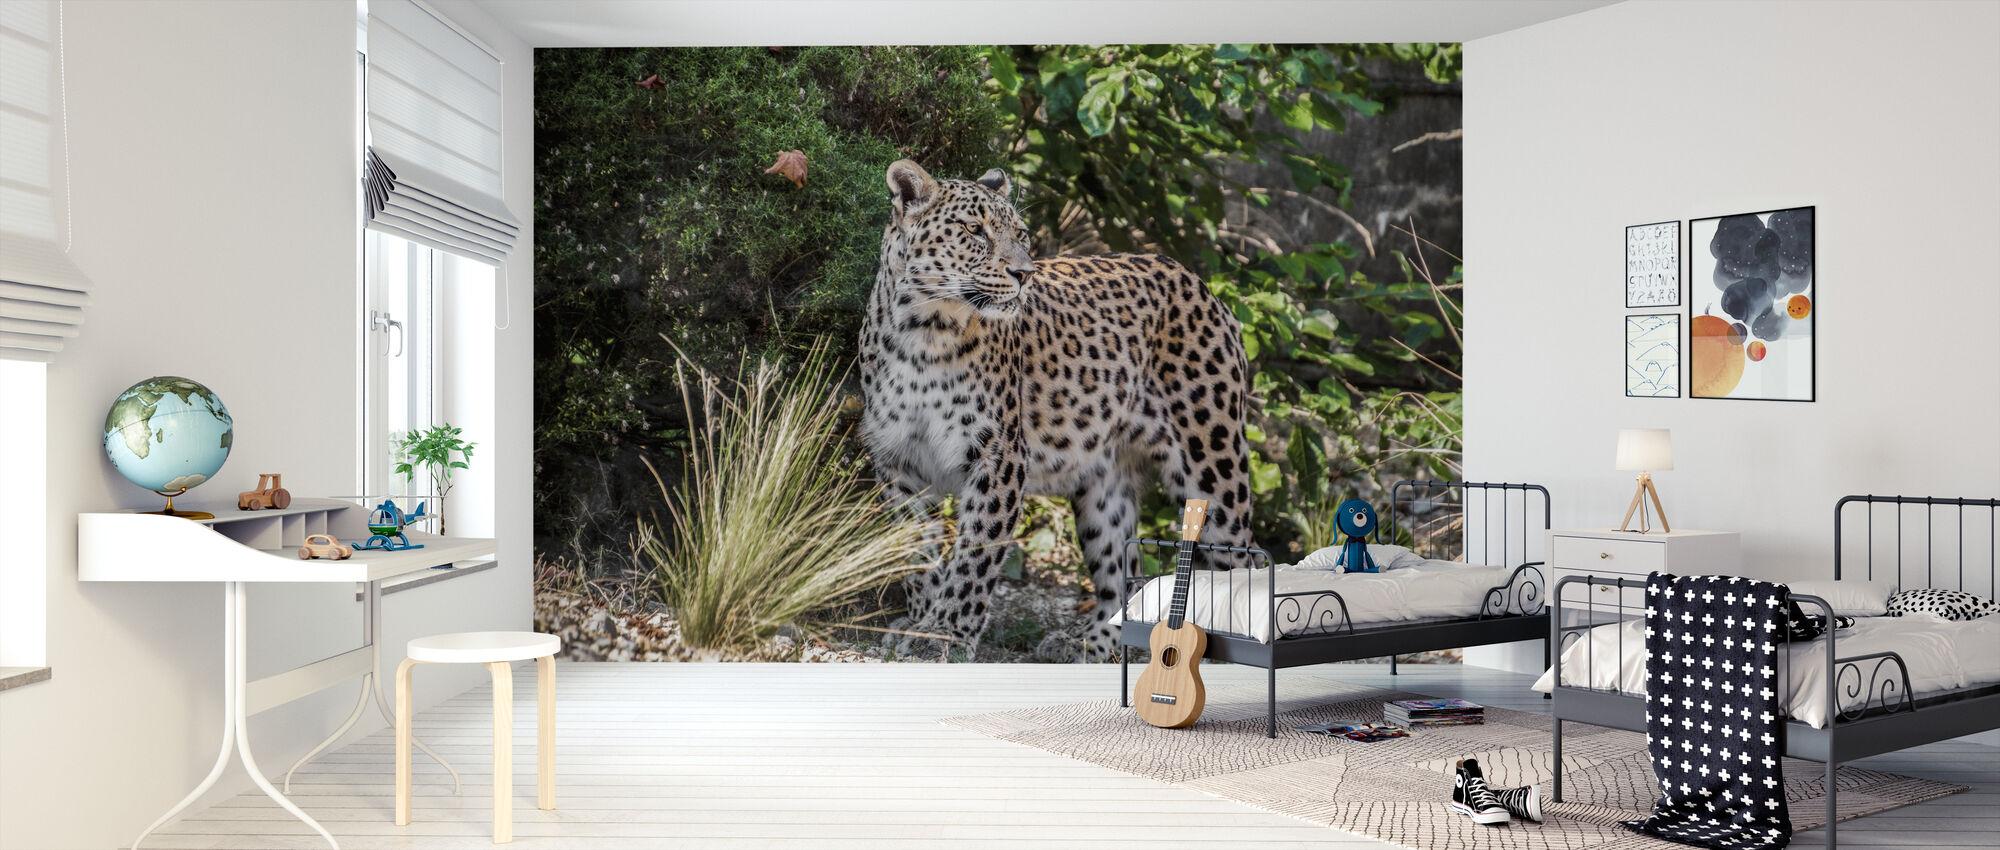 Leopard stirrer - Tapet - Barnerom